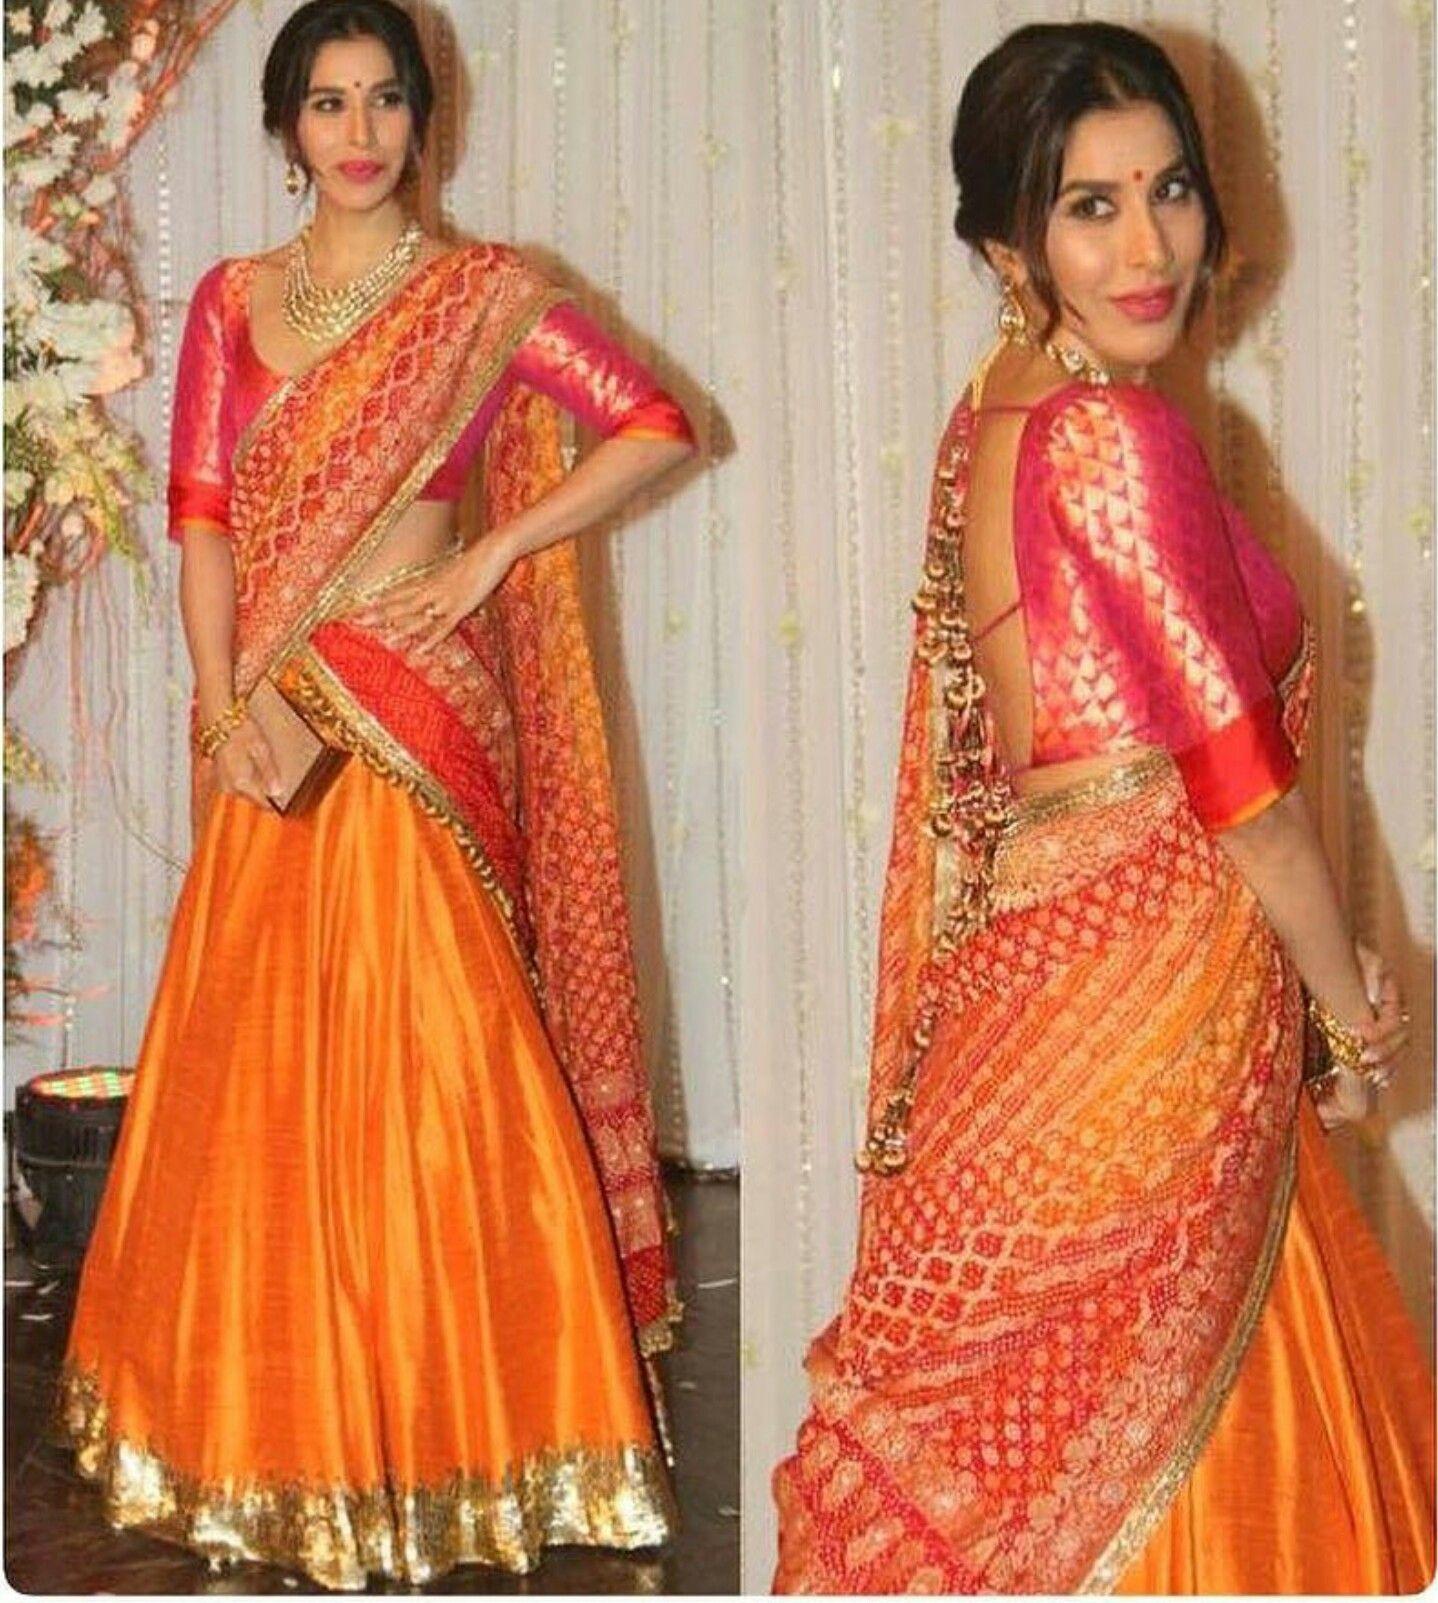 Wedding Hairstyle On Saree: Orange Pink Half Saree, Pretty Combo